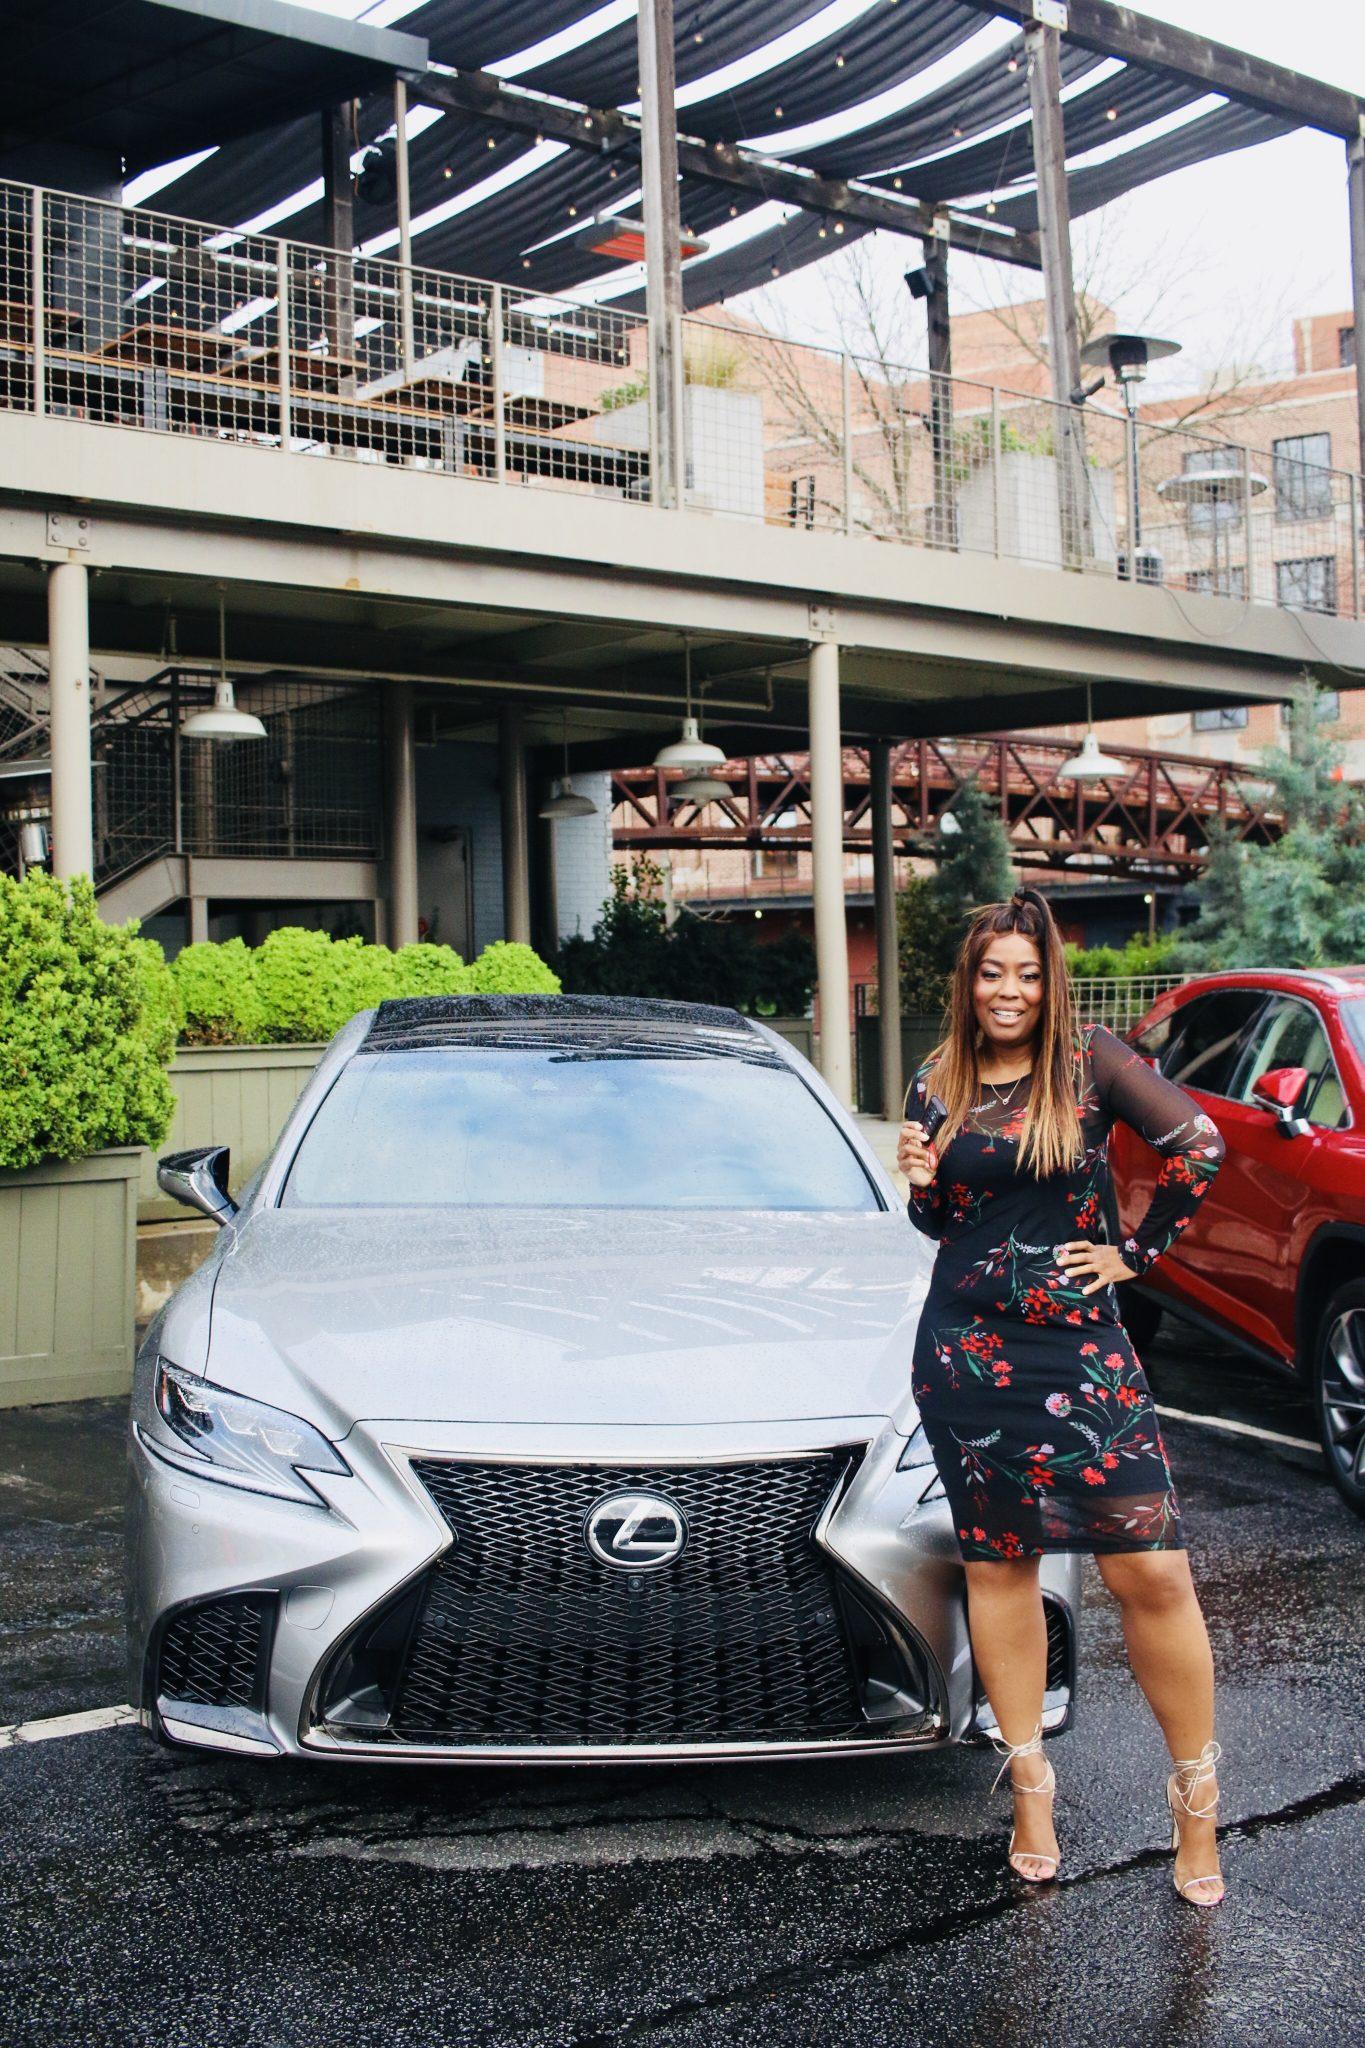 Lexus Of Atlanta >> Lexus Celebrates The 2018 Auto Show In Atlanta Talking